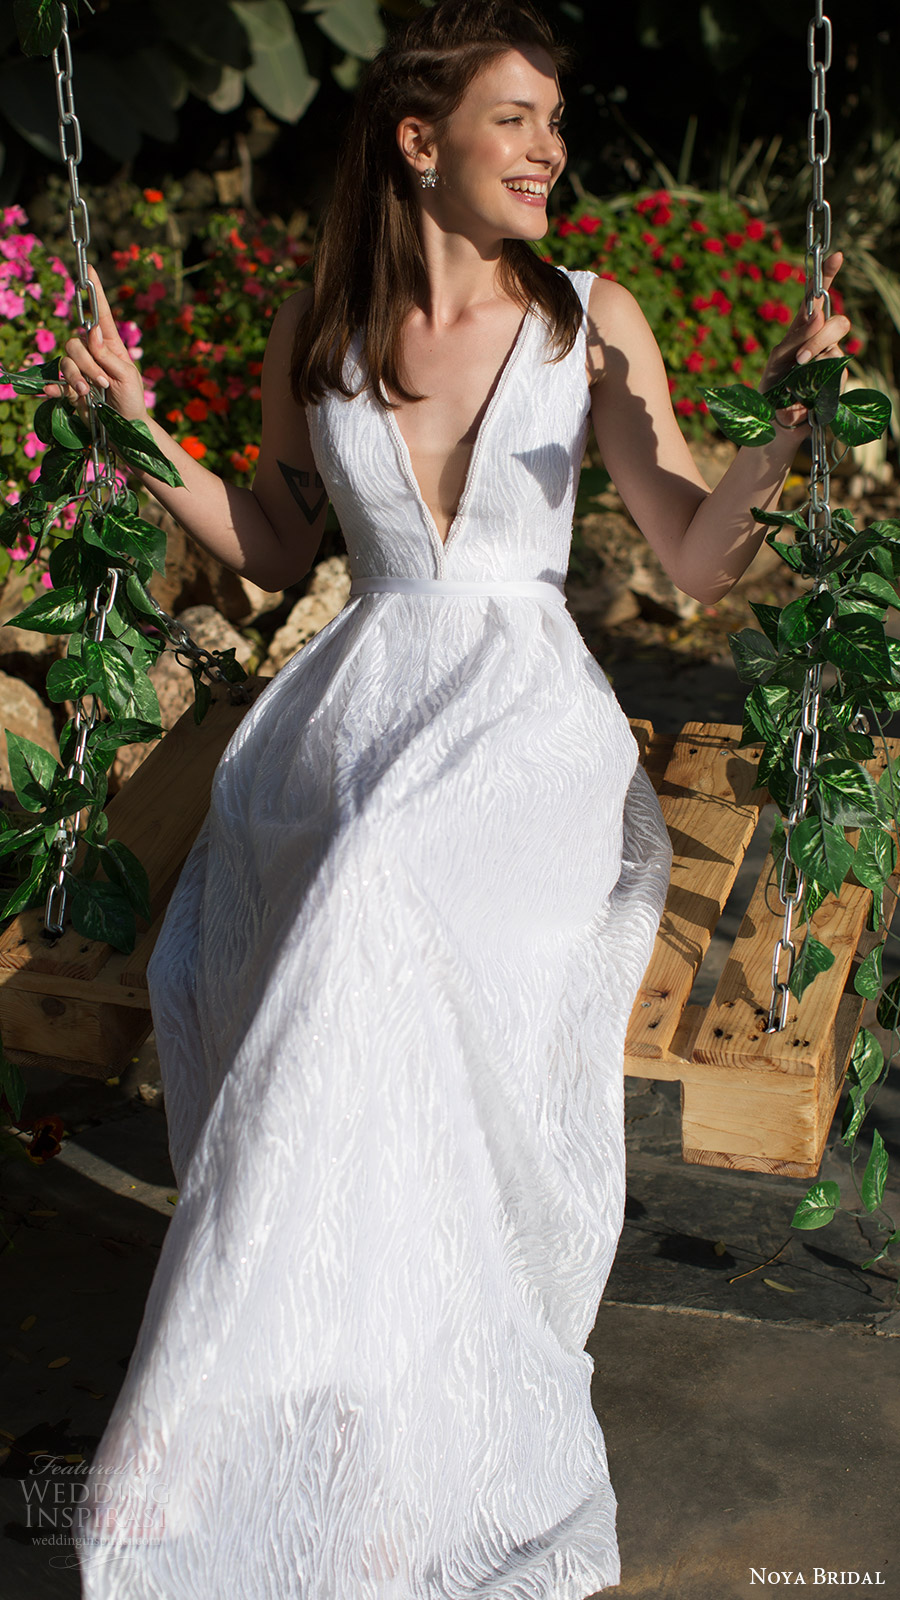 noya bridal 2016 sleeveless thick straps deep vneck aline wedding dress (1212) fv pockets